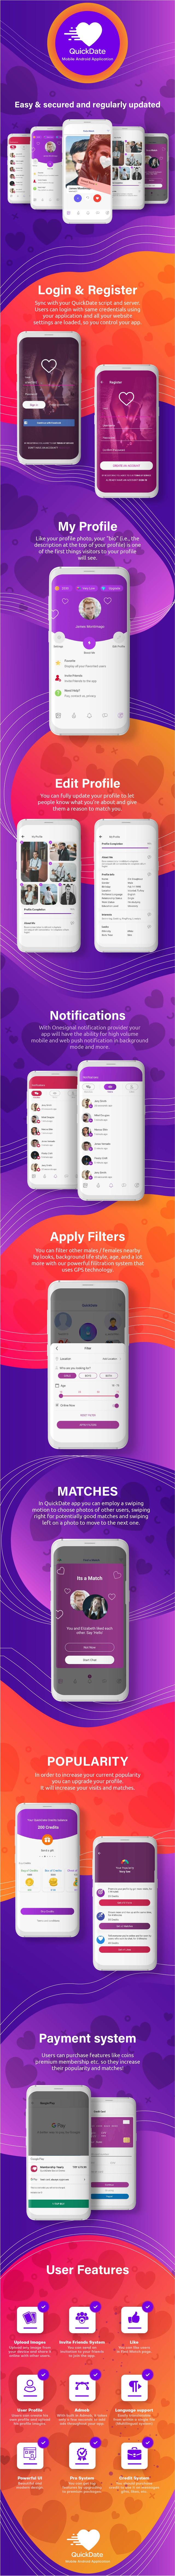 QuickDate Android - Aplicativo Mobile Social Dating Platform - 4